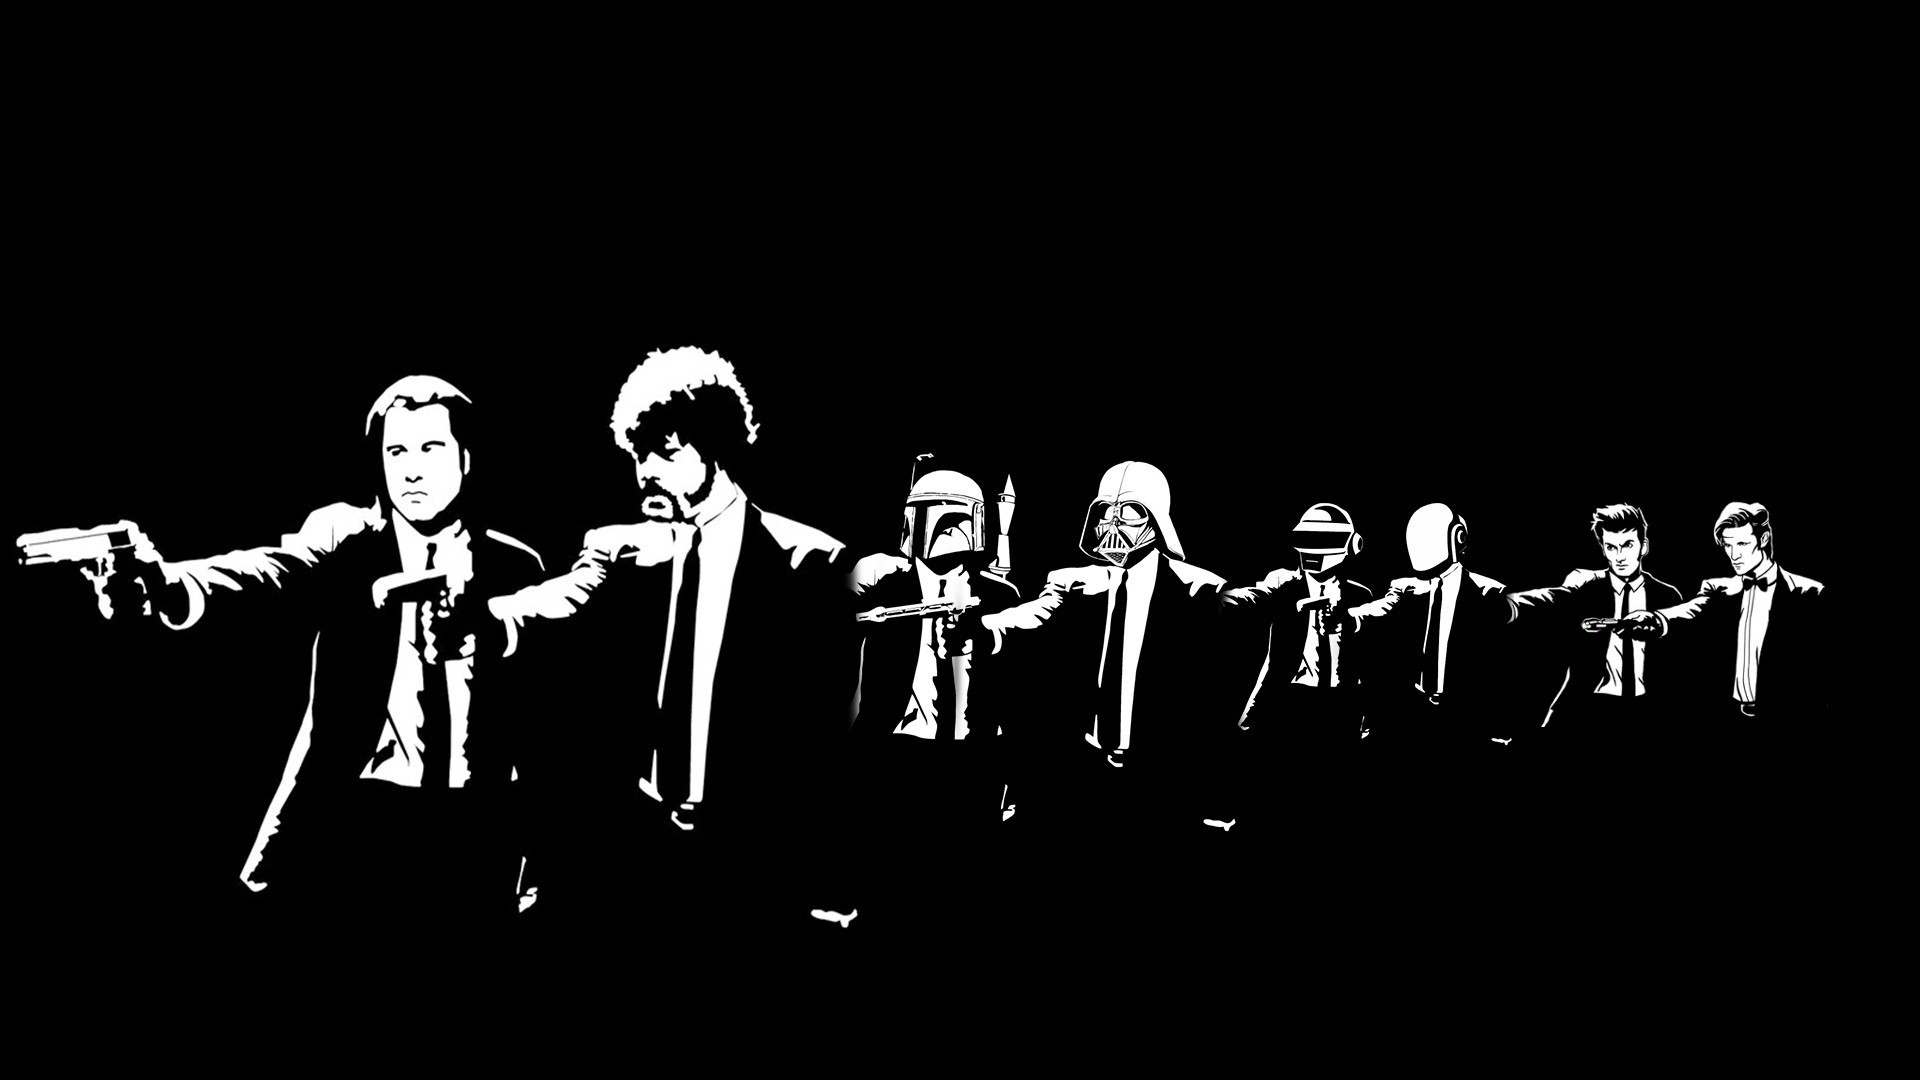 Pulp Fiction Wallpaper 66 Pictures